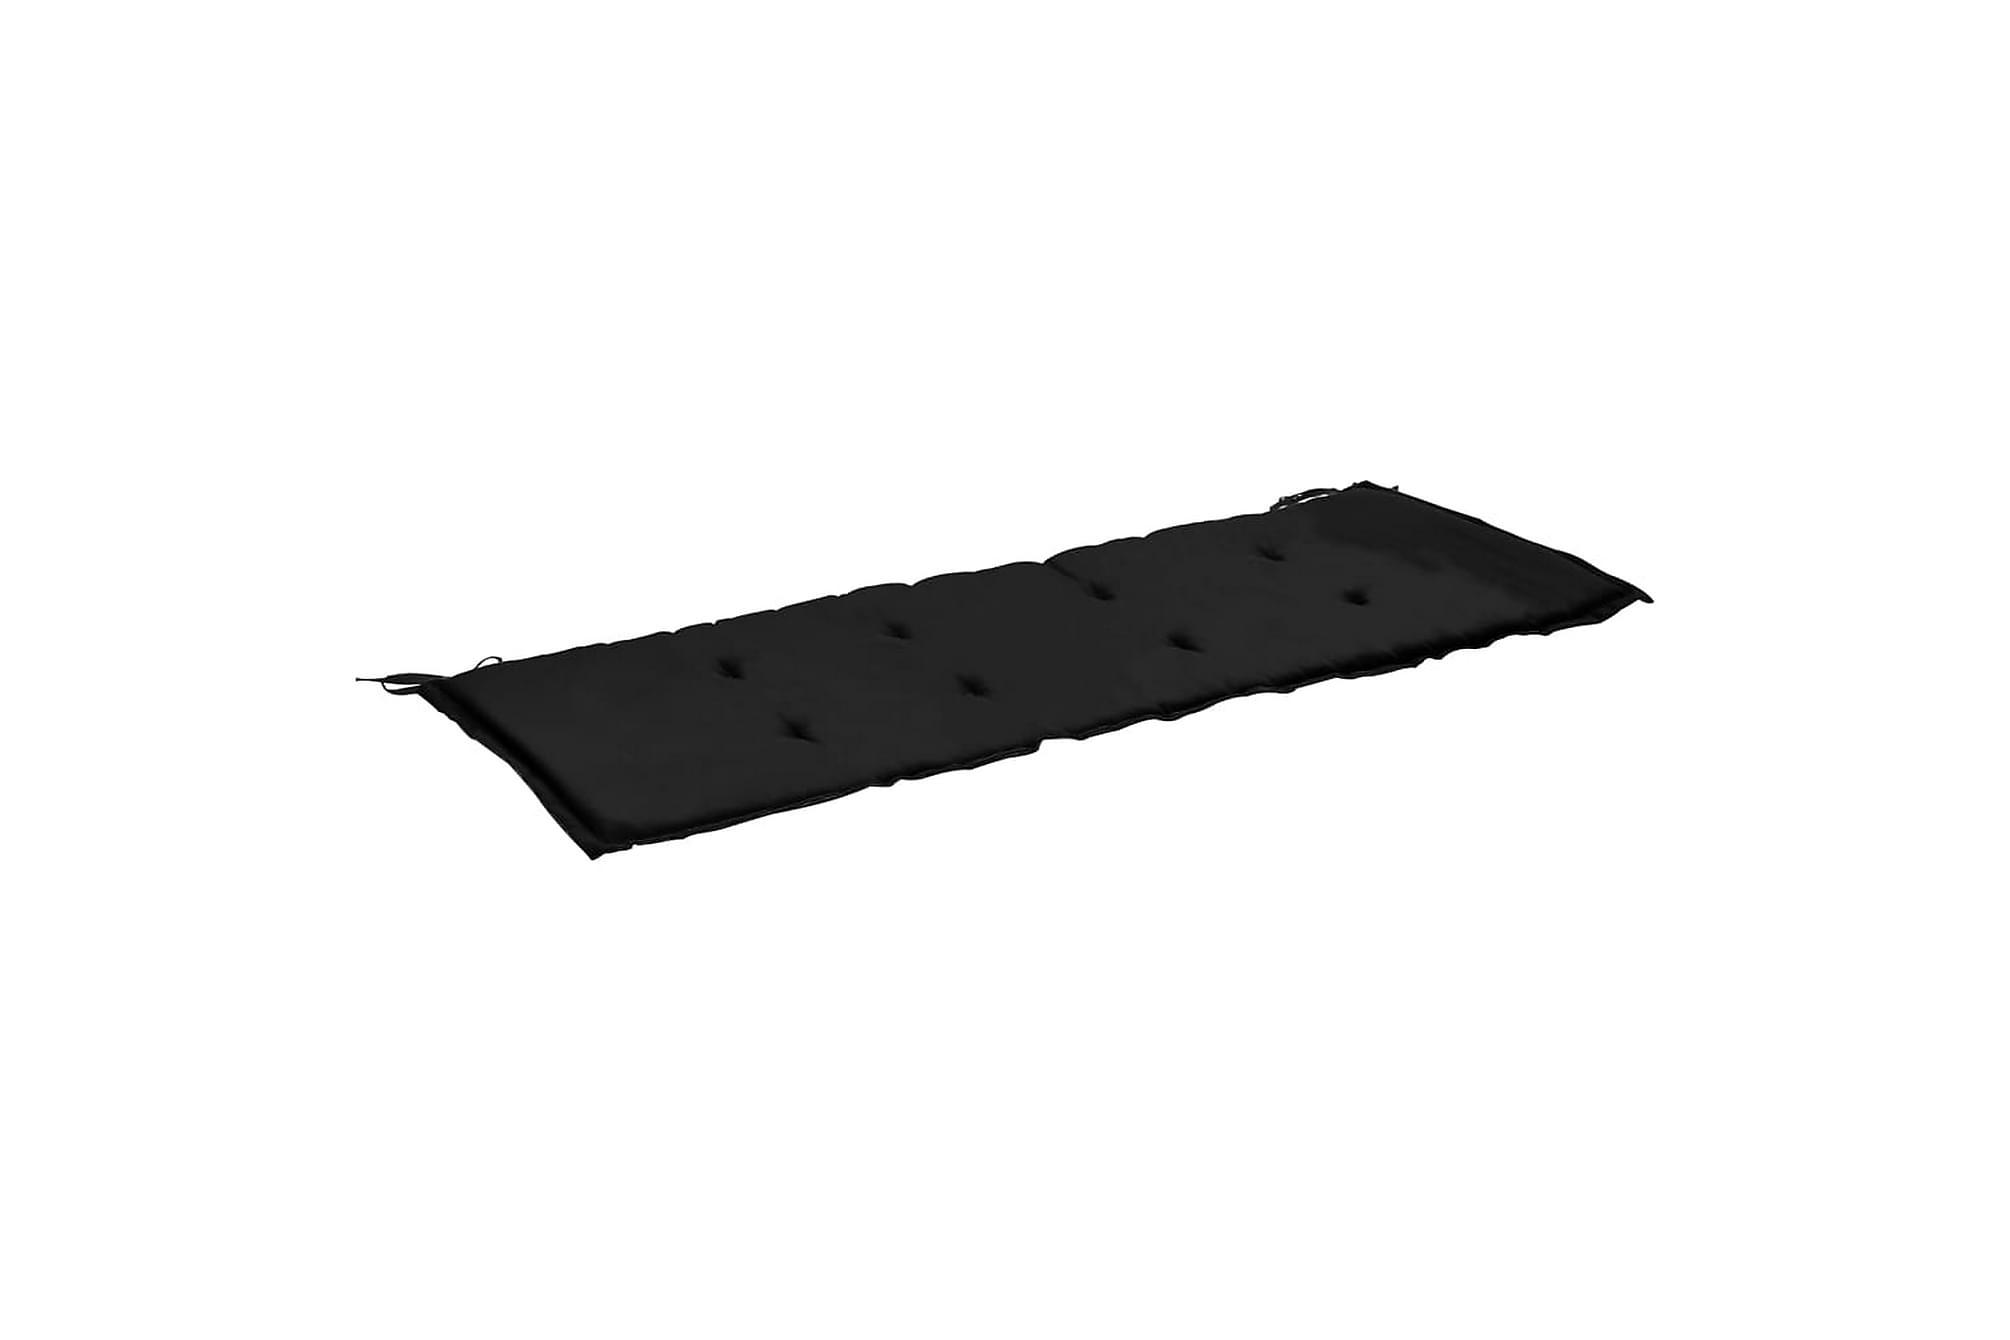 Bänkdyna för trädgården svart och grå 120x50x3 cm, Soffdynor